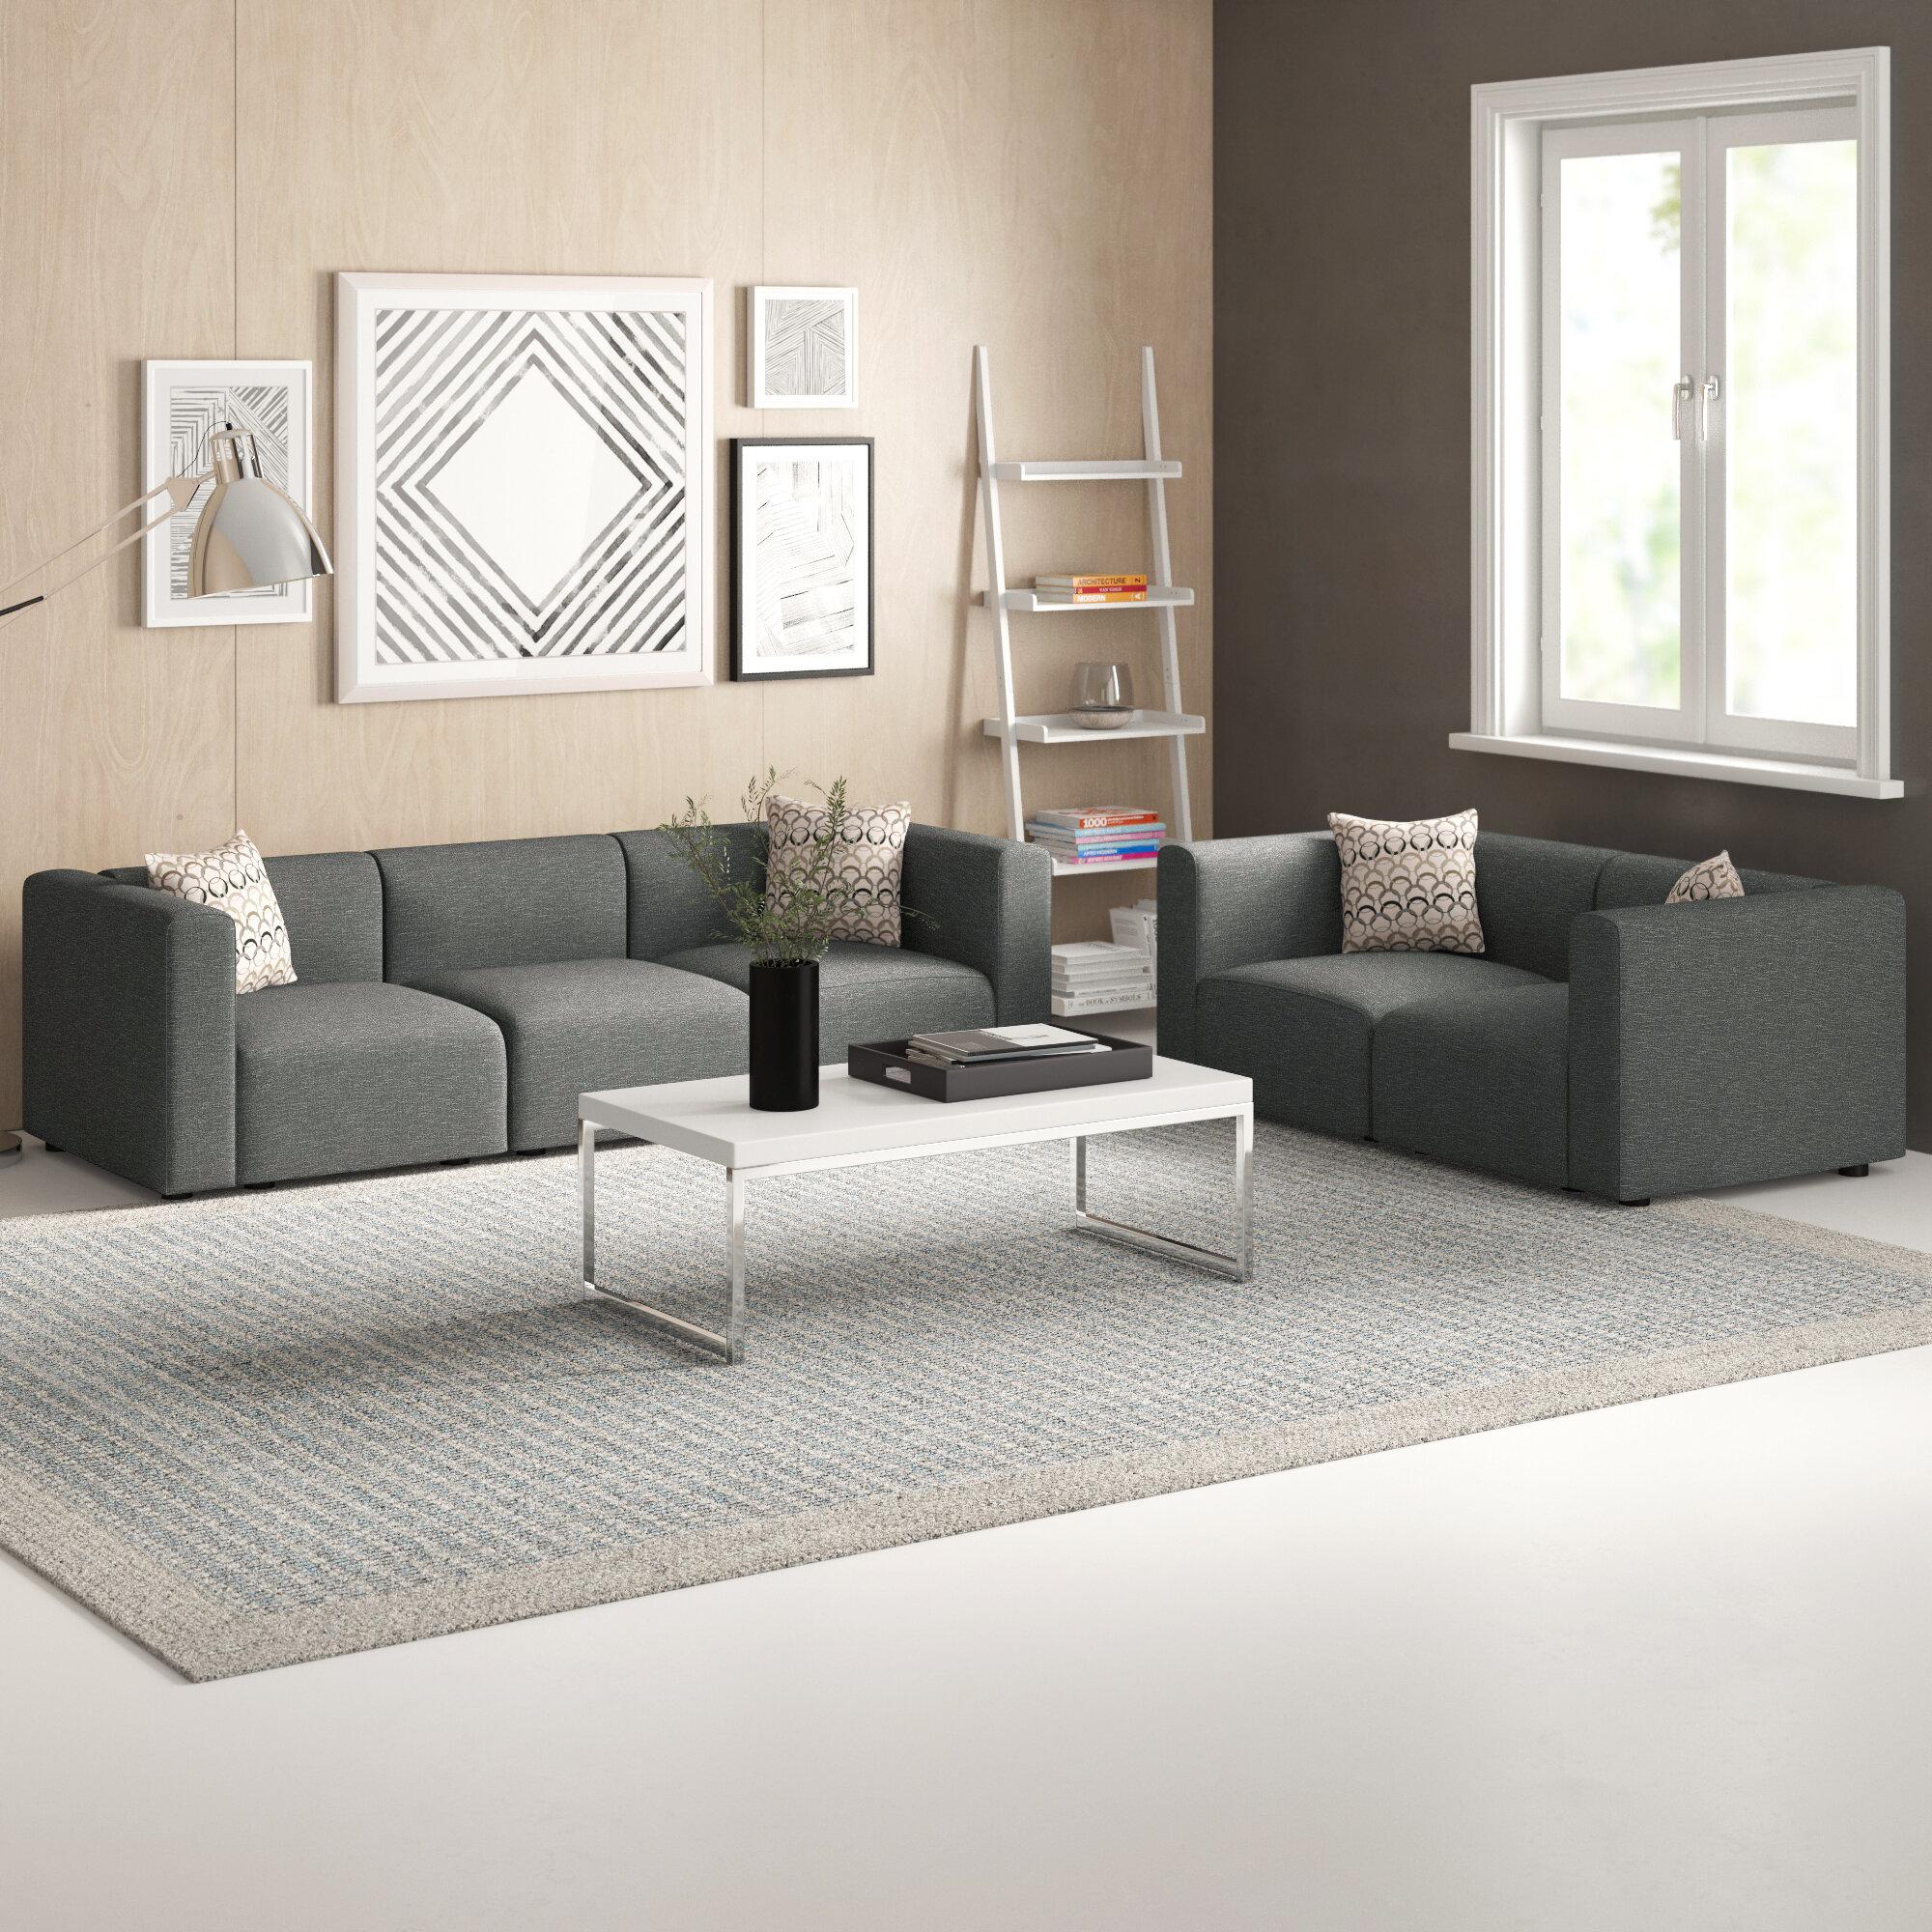 Zipcode Design Nash 2 Piece Modular Living Room Sofa Set